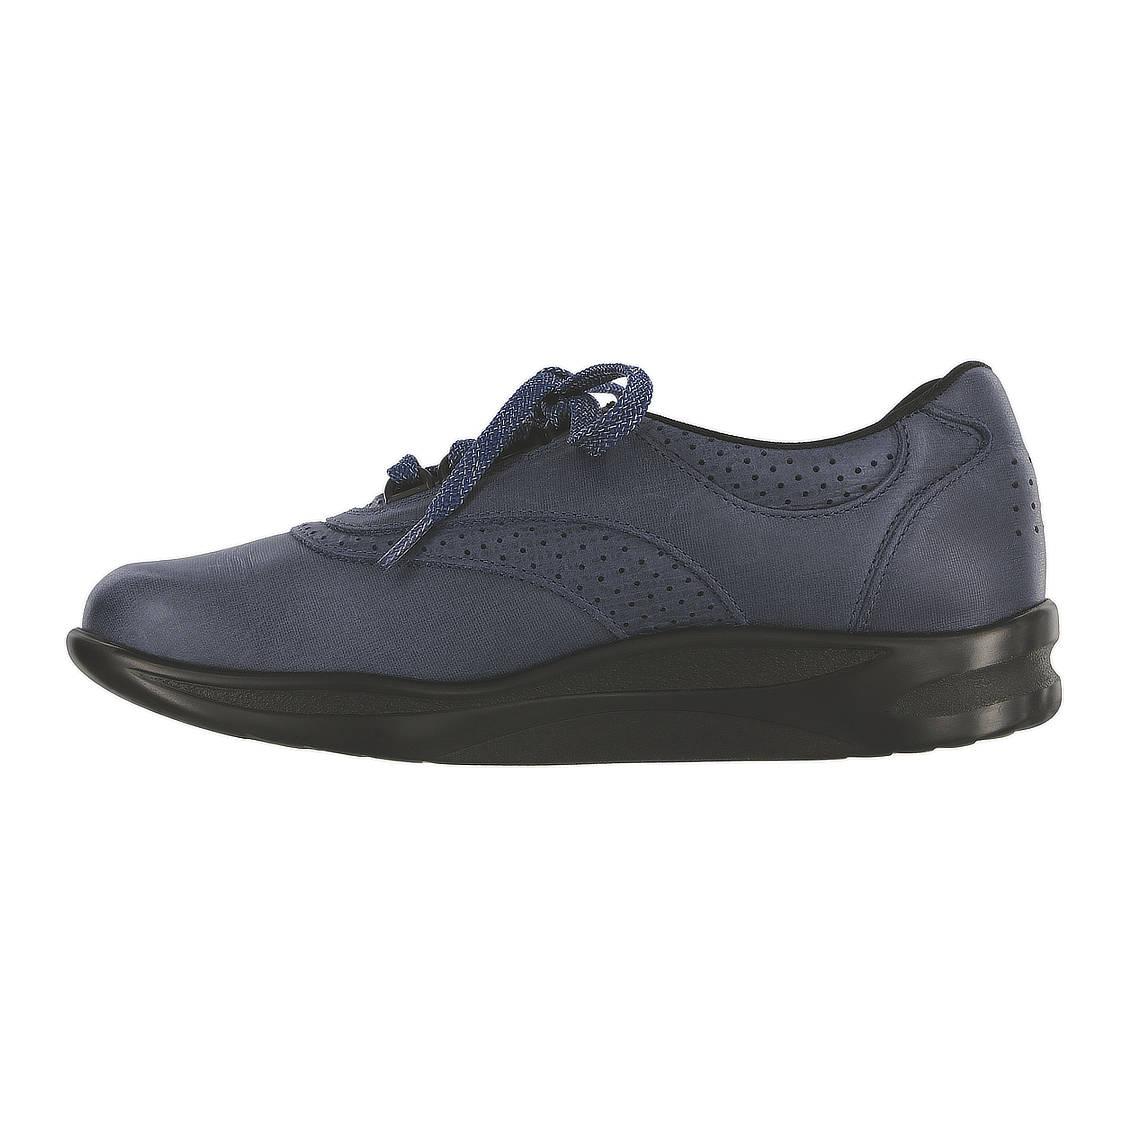 sas-womens-walk-easy-indigo-2380-700-2